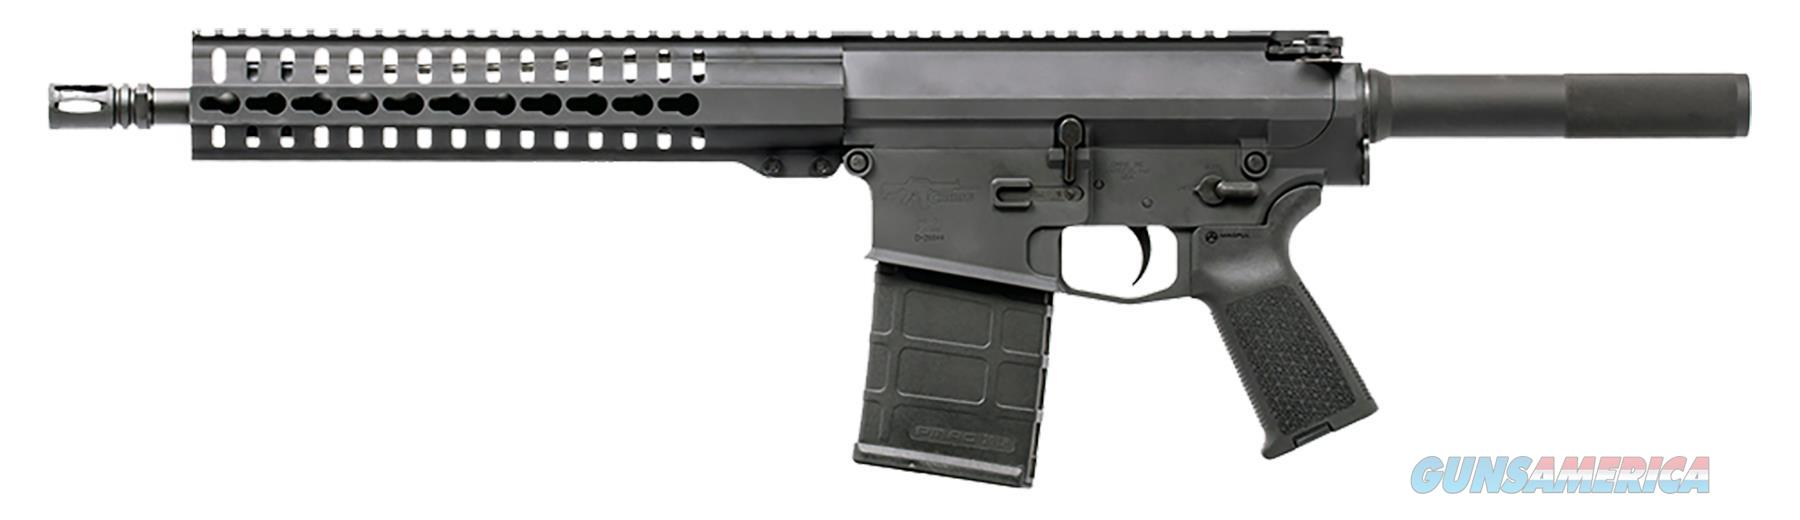 "Cmmg 38A923e Mk3 K Ar Pistol Semi-Automatic 308 Winchester/7.62 Nato 12.5"" 20+1 Aluminum Black 38A923E  Guns > Pistols > C Misc Pistols"